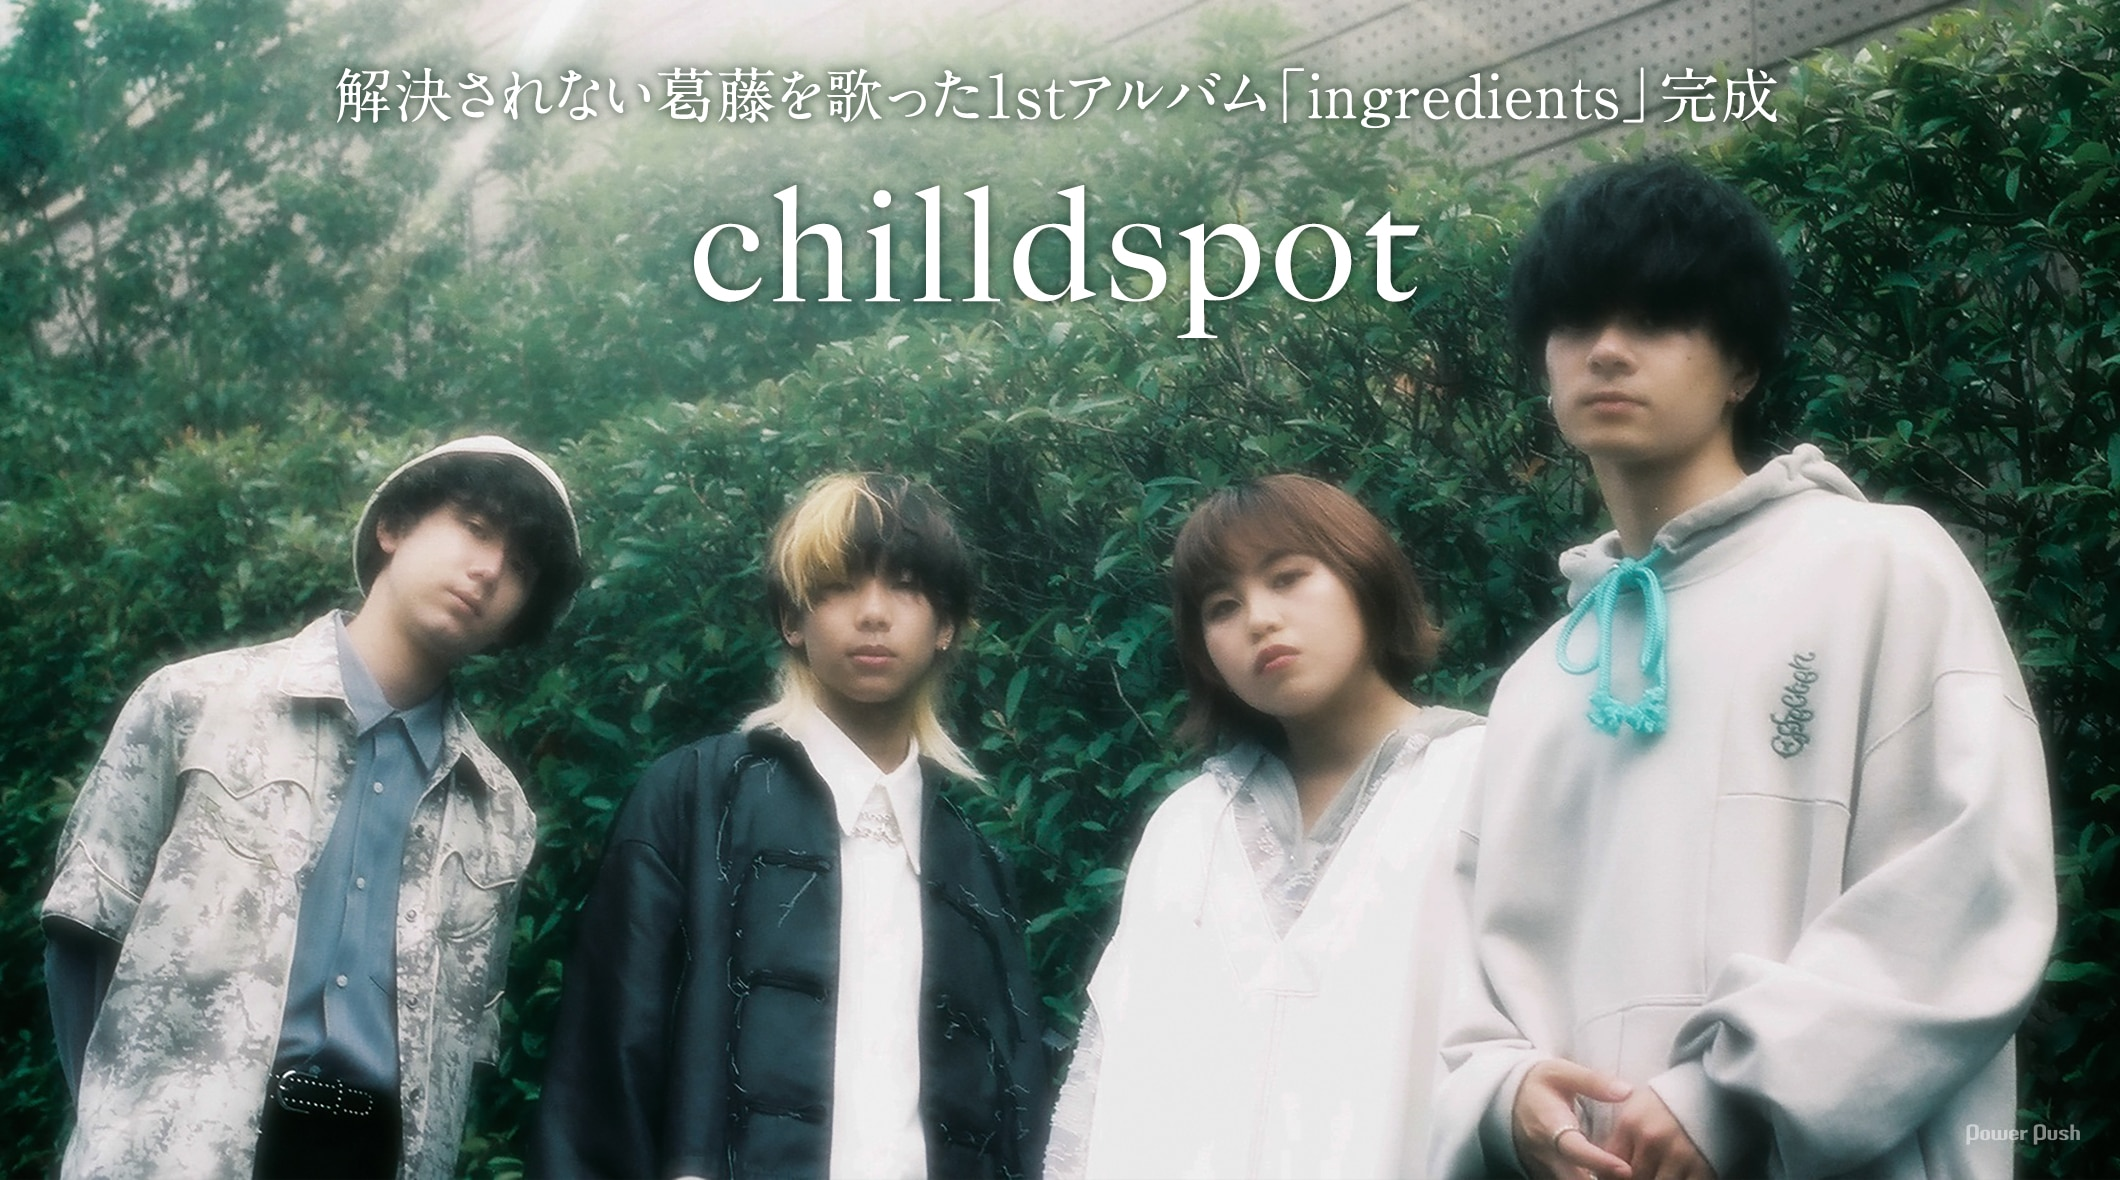 chilldspot 解決されない葛藤を歌った1stアルバム「ingredients」完成